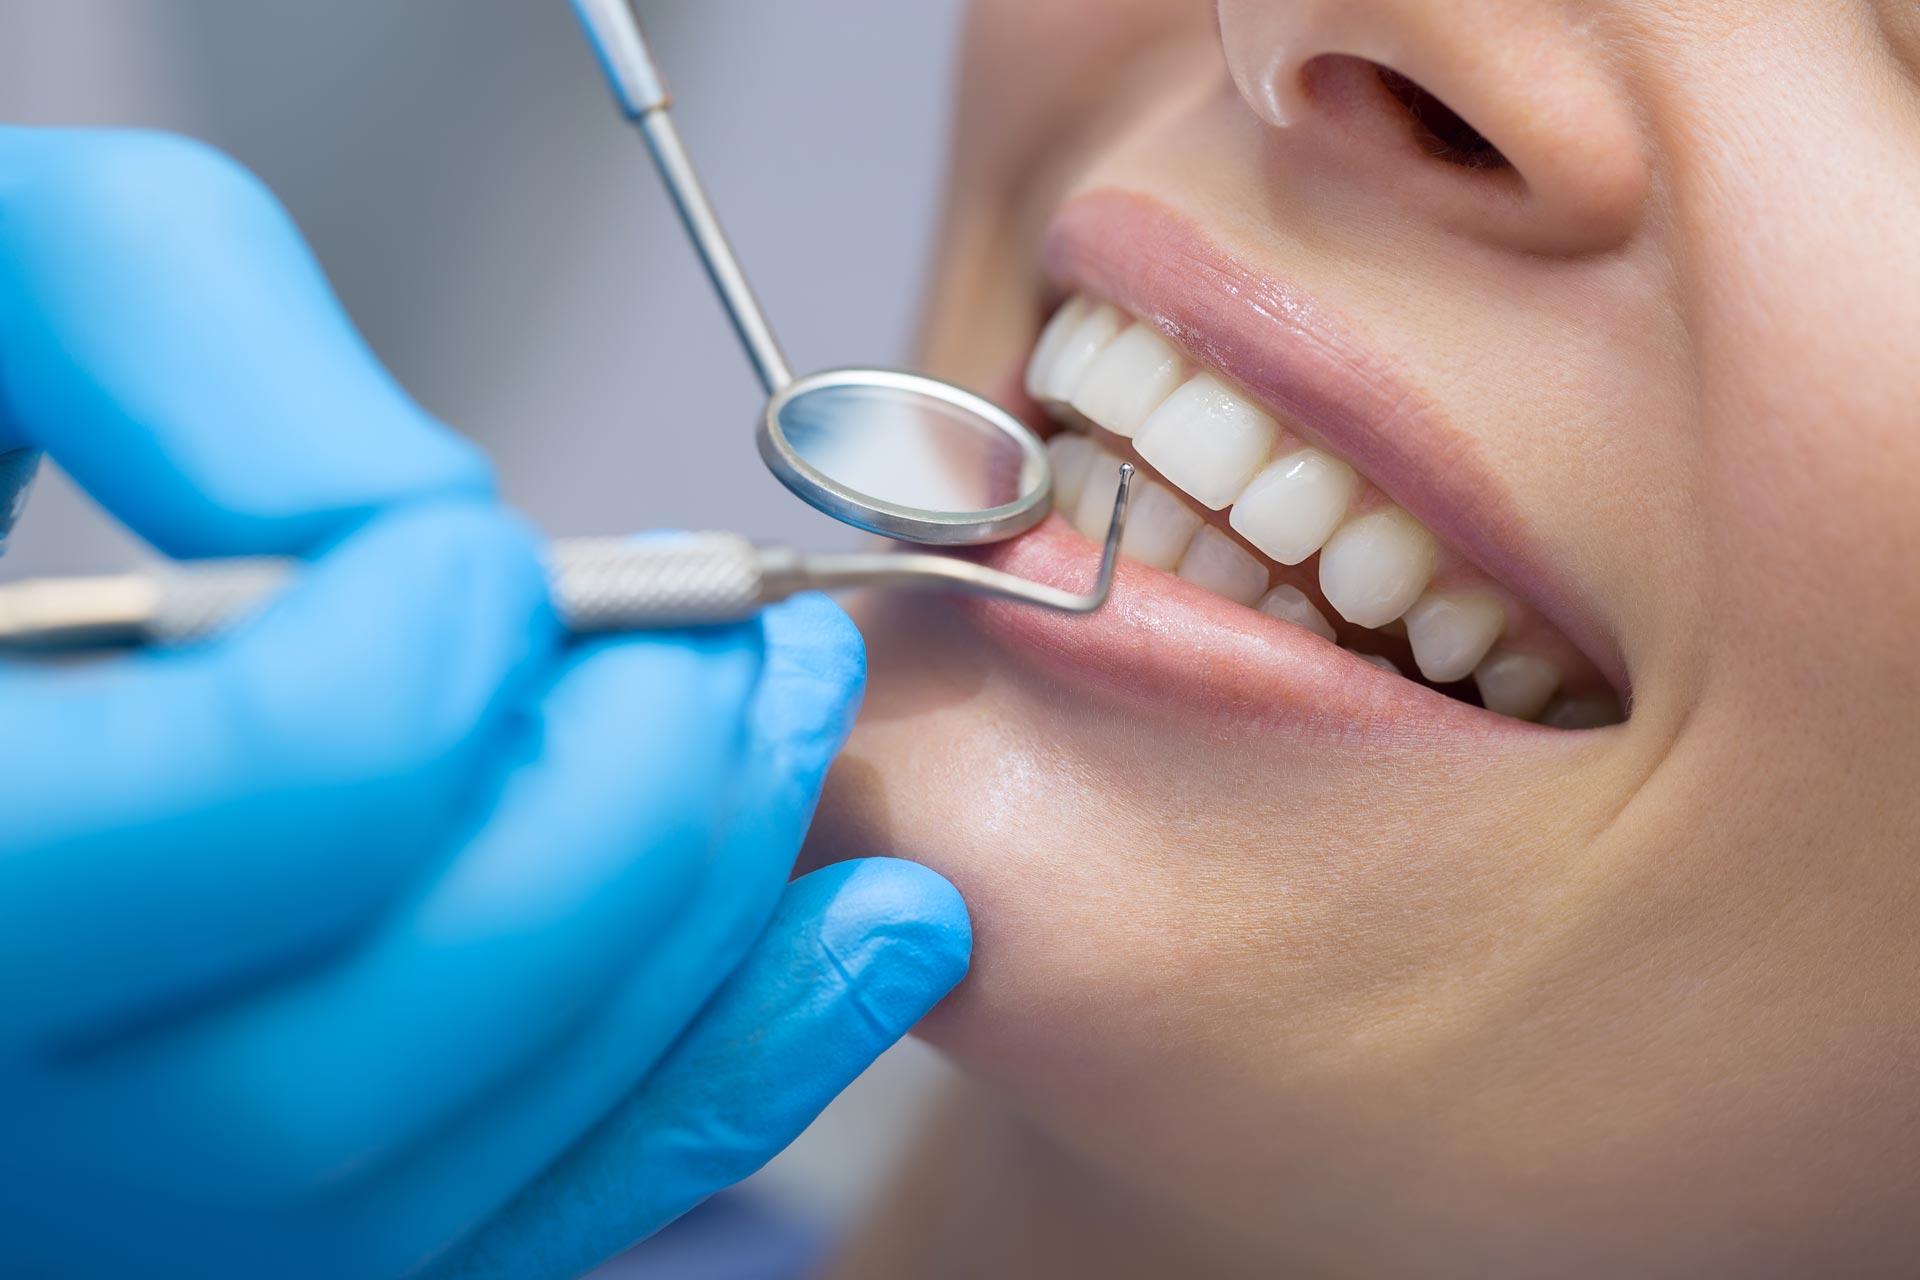 emergency dentist in Sydney, dentist near me